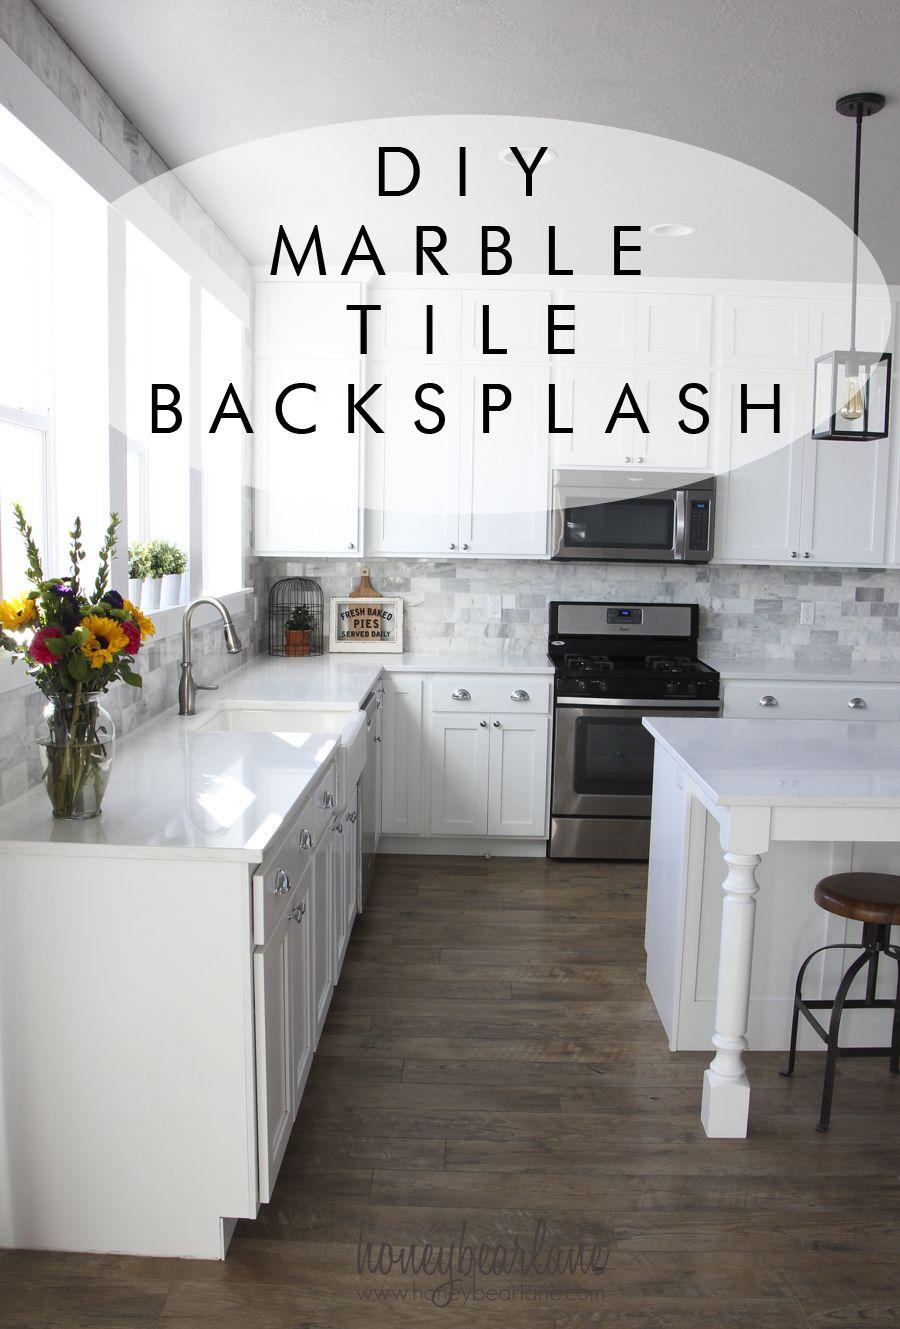 My DIY Marble Backsplash | Marble tile backsplash, Kitchen styling ...